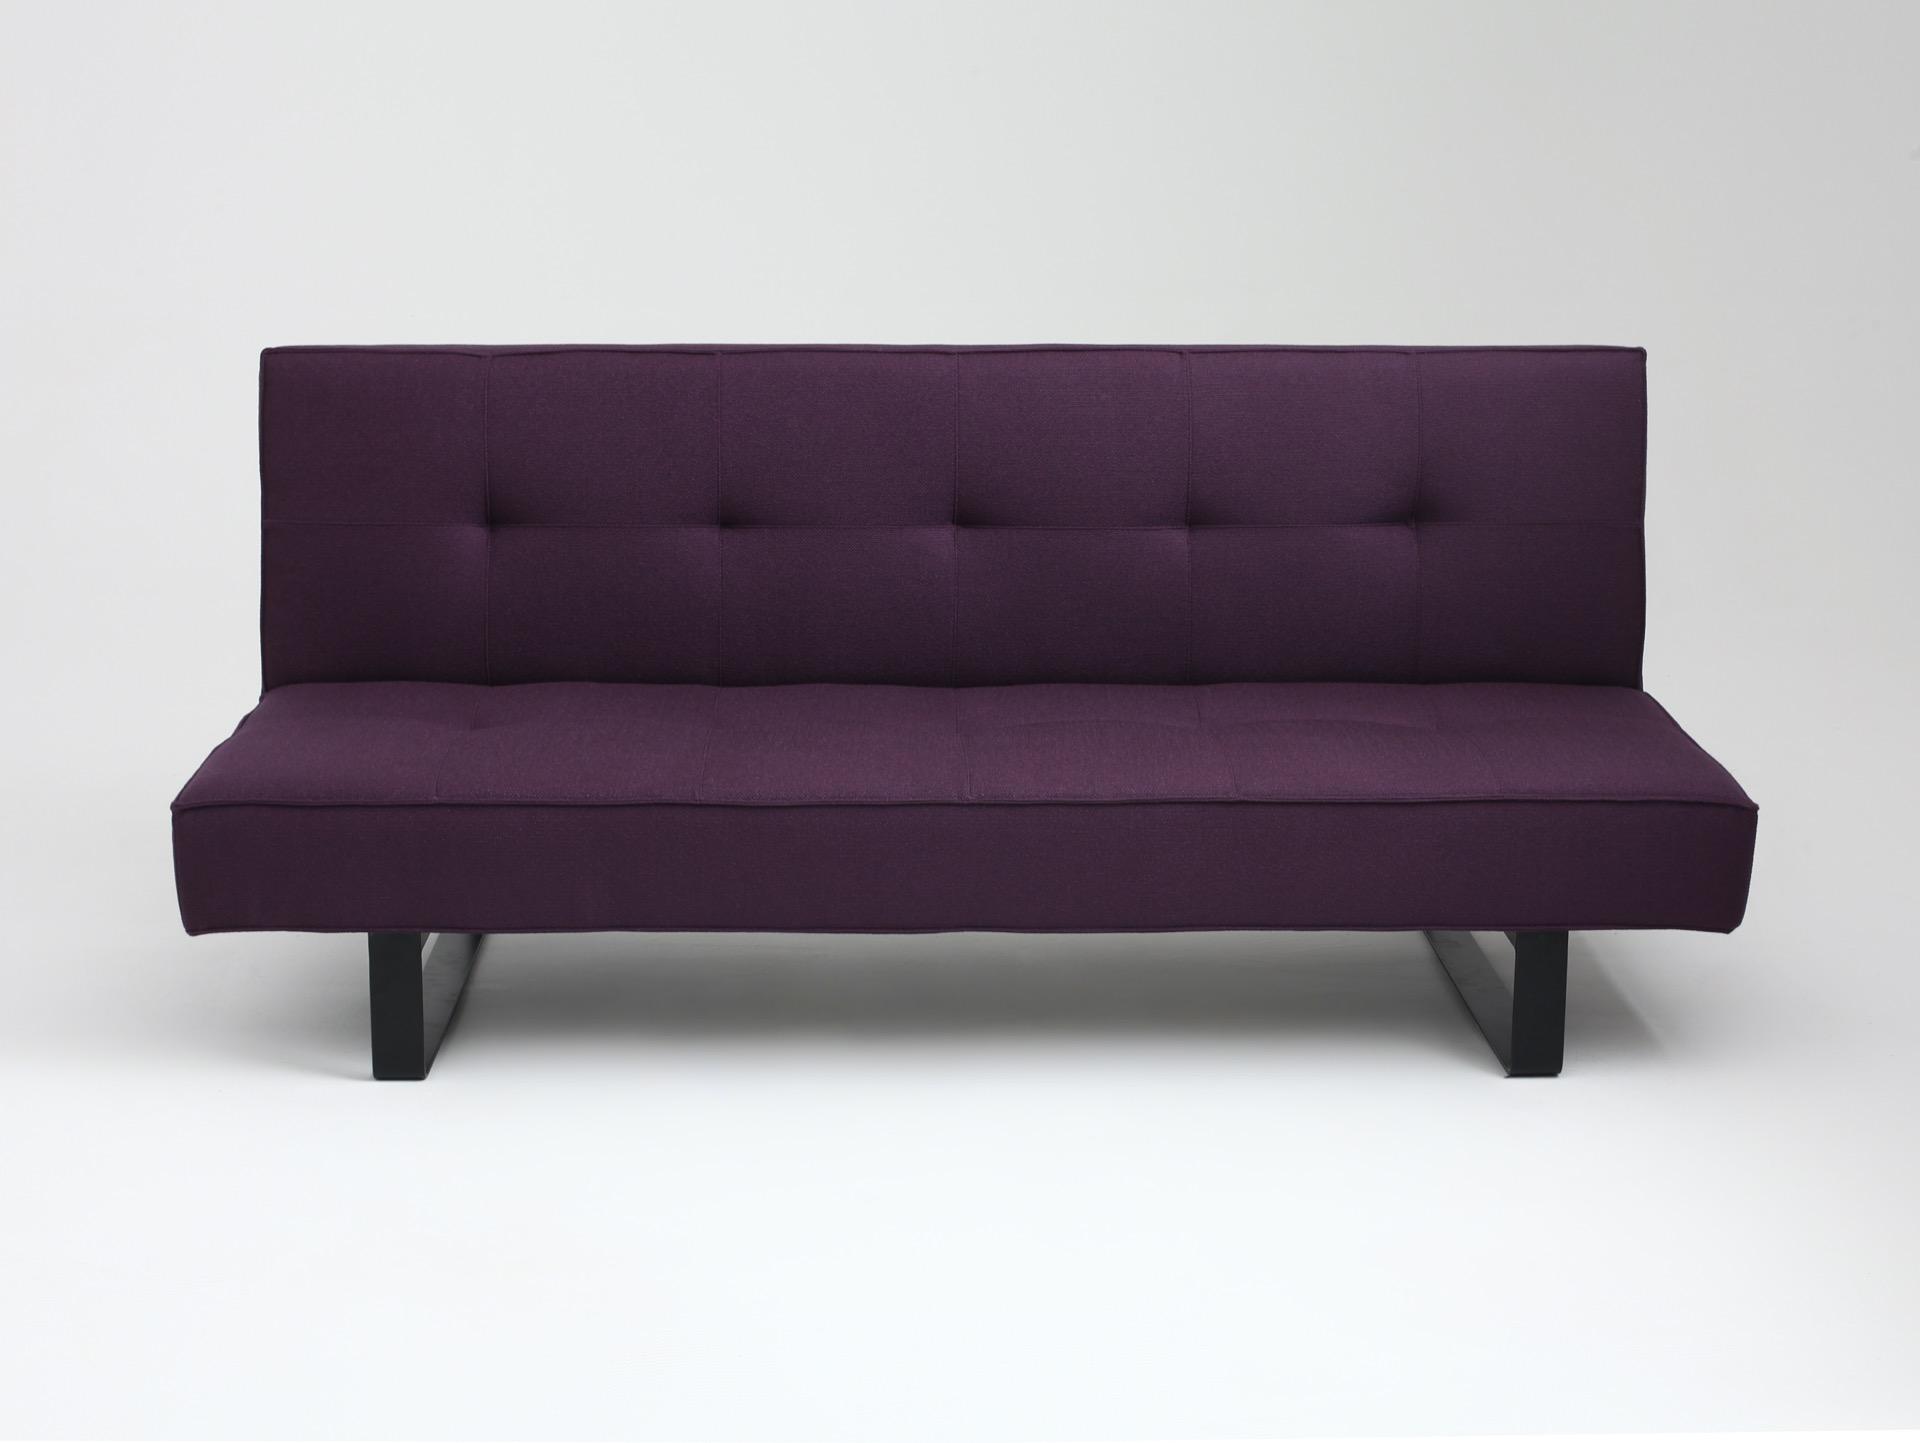 2-Sitzer Schlafsofa Glatter